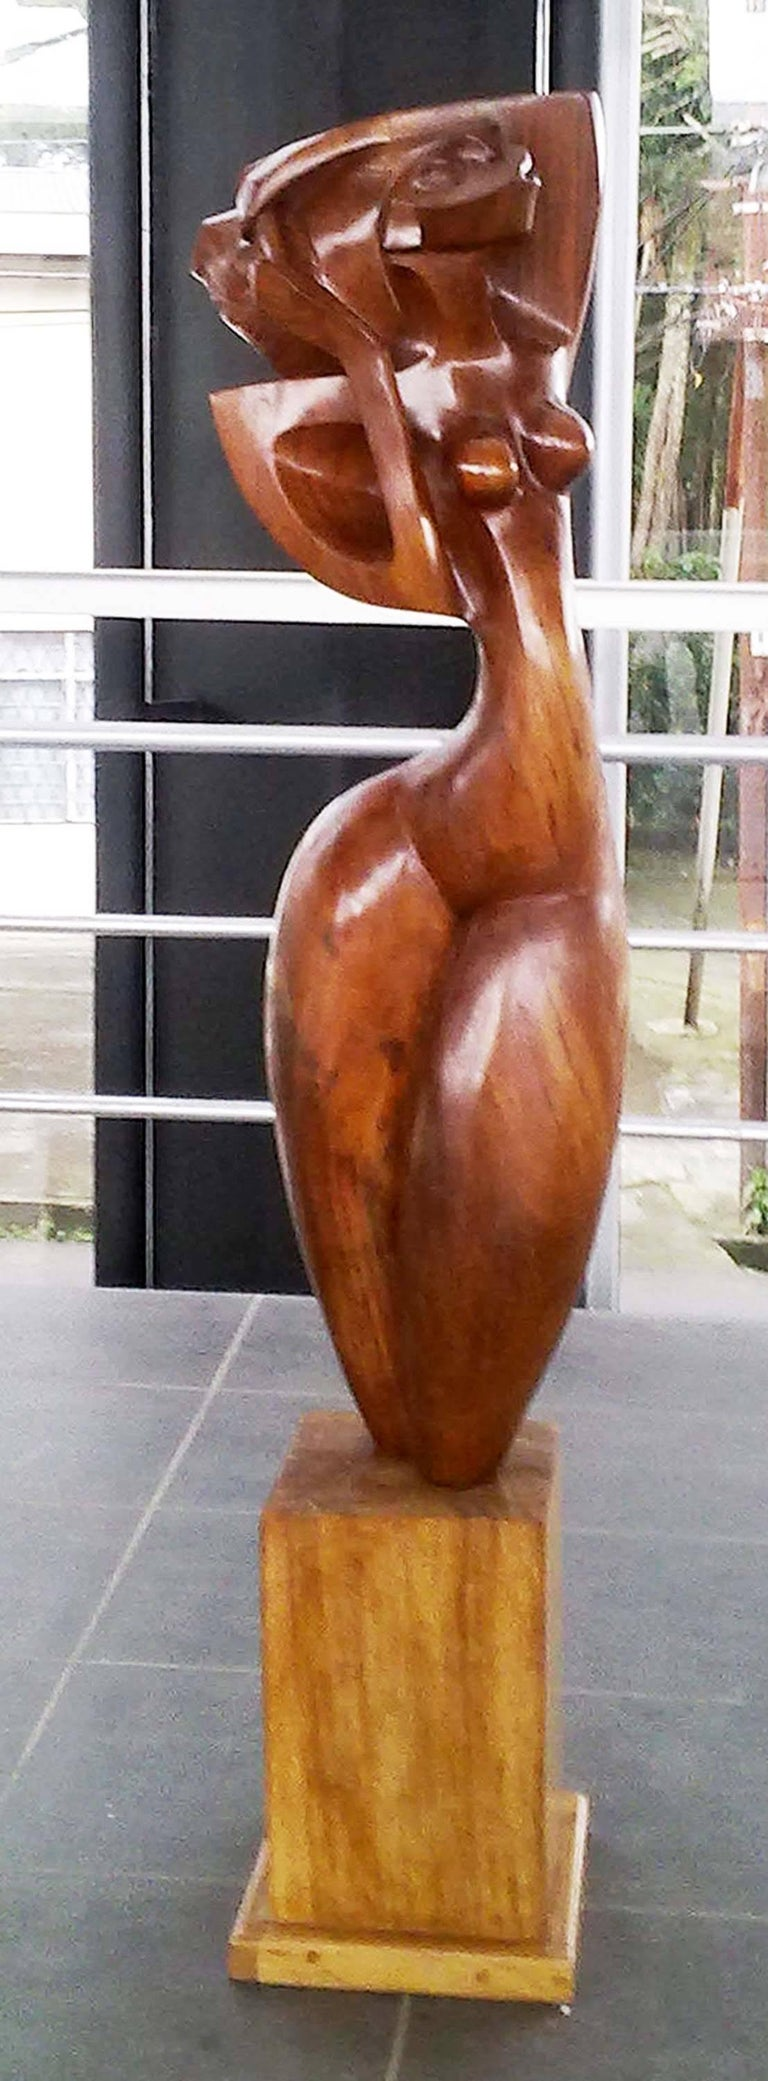 Ulises Jimenez Obregon Nude Sculpture - Rebecca